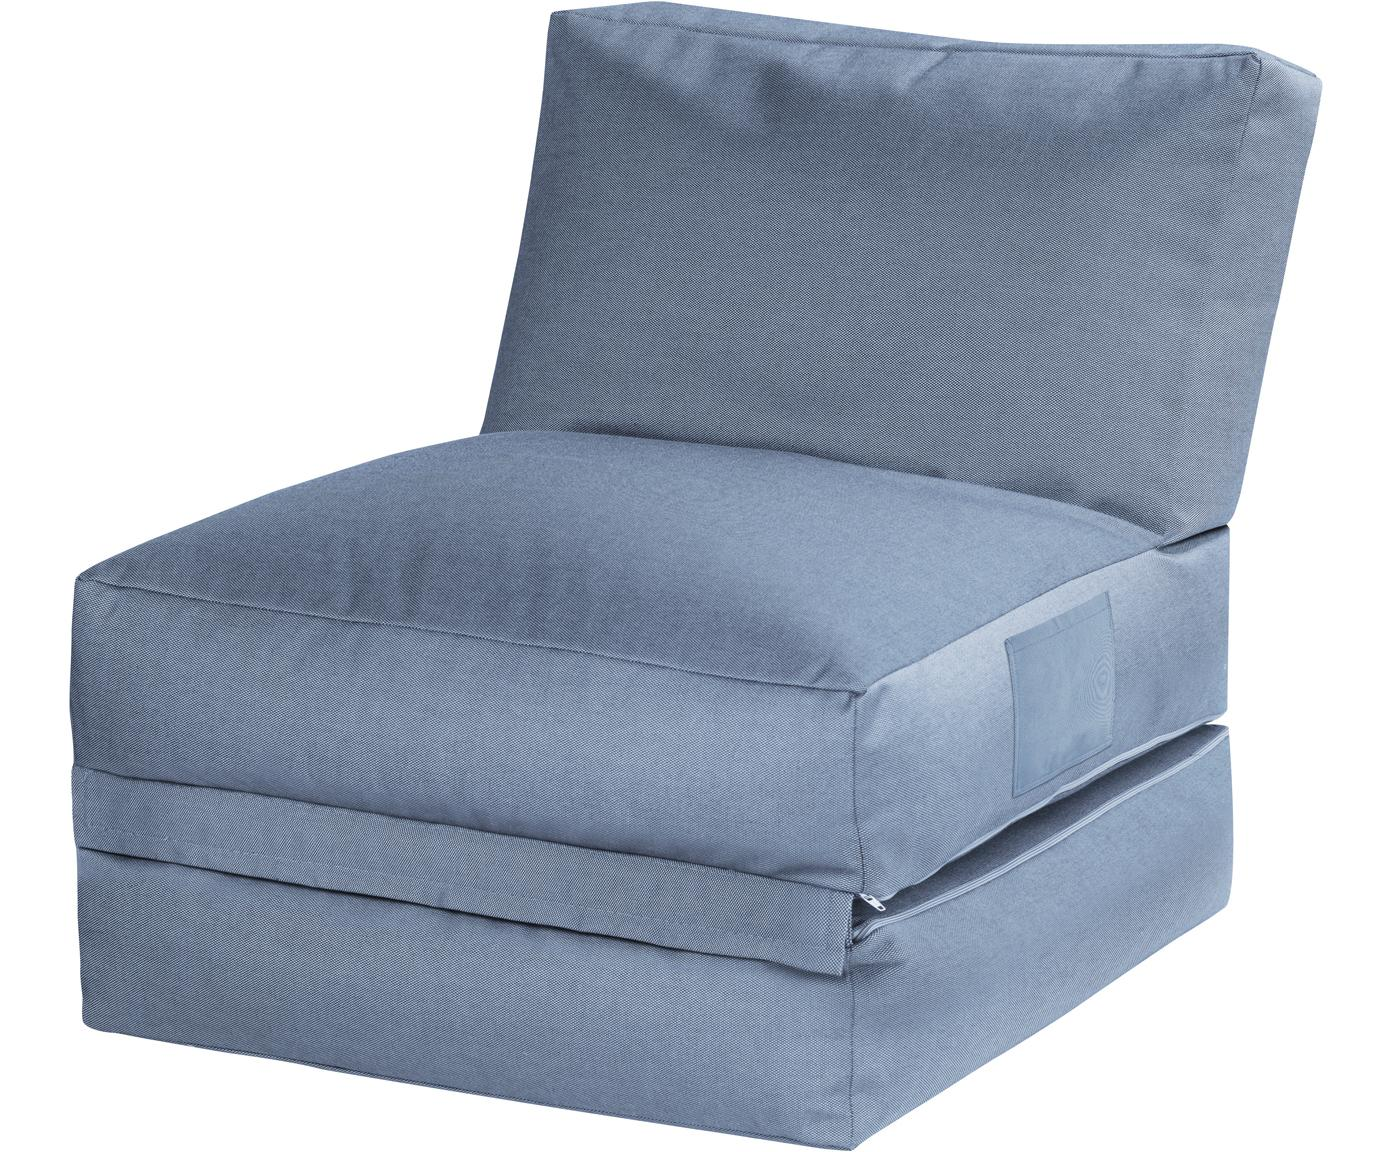 Outdoor loungefauteuil Twist met ligfunctie, Bekleding: polyacryl dralon (garen g, Blauw, B 70  x D 80 cm